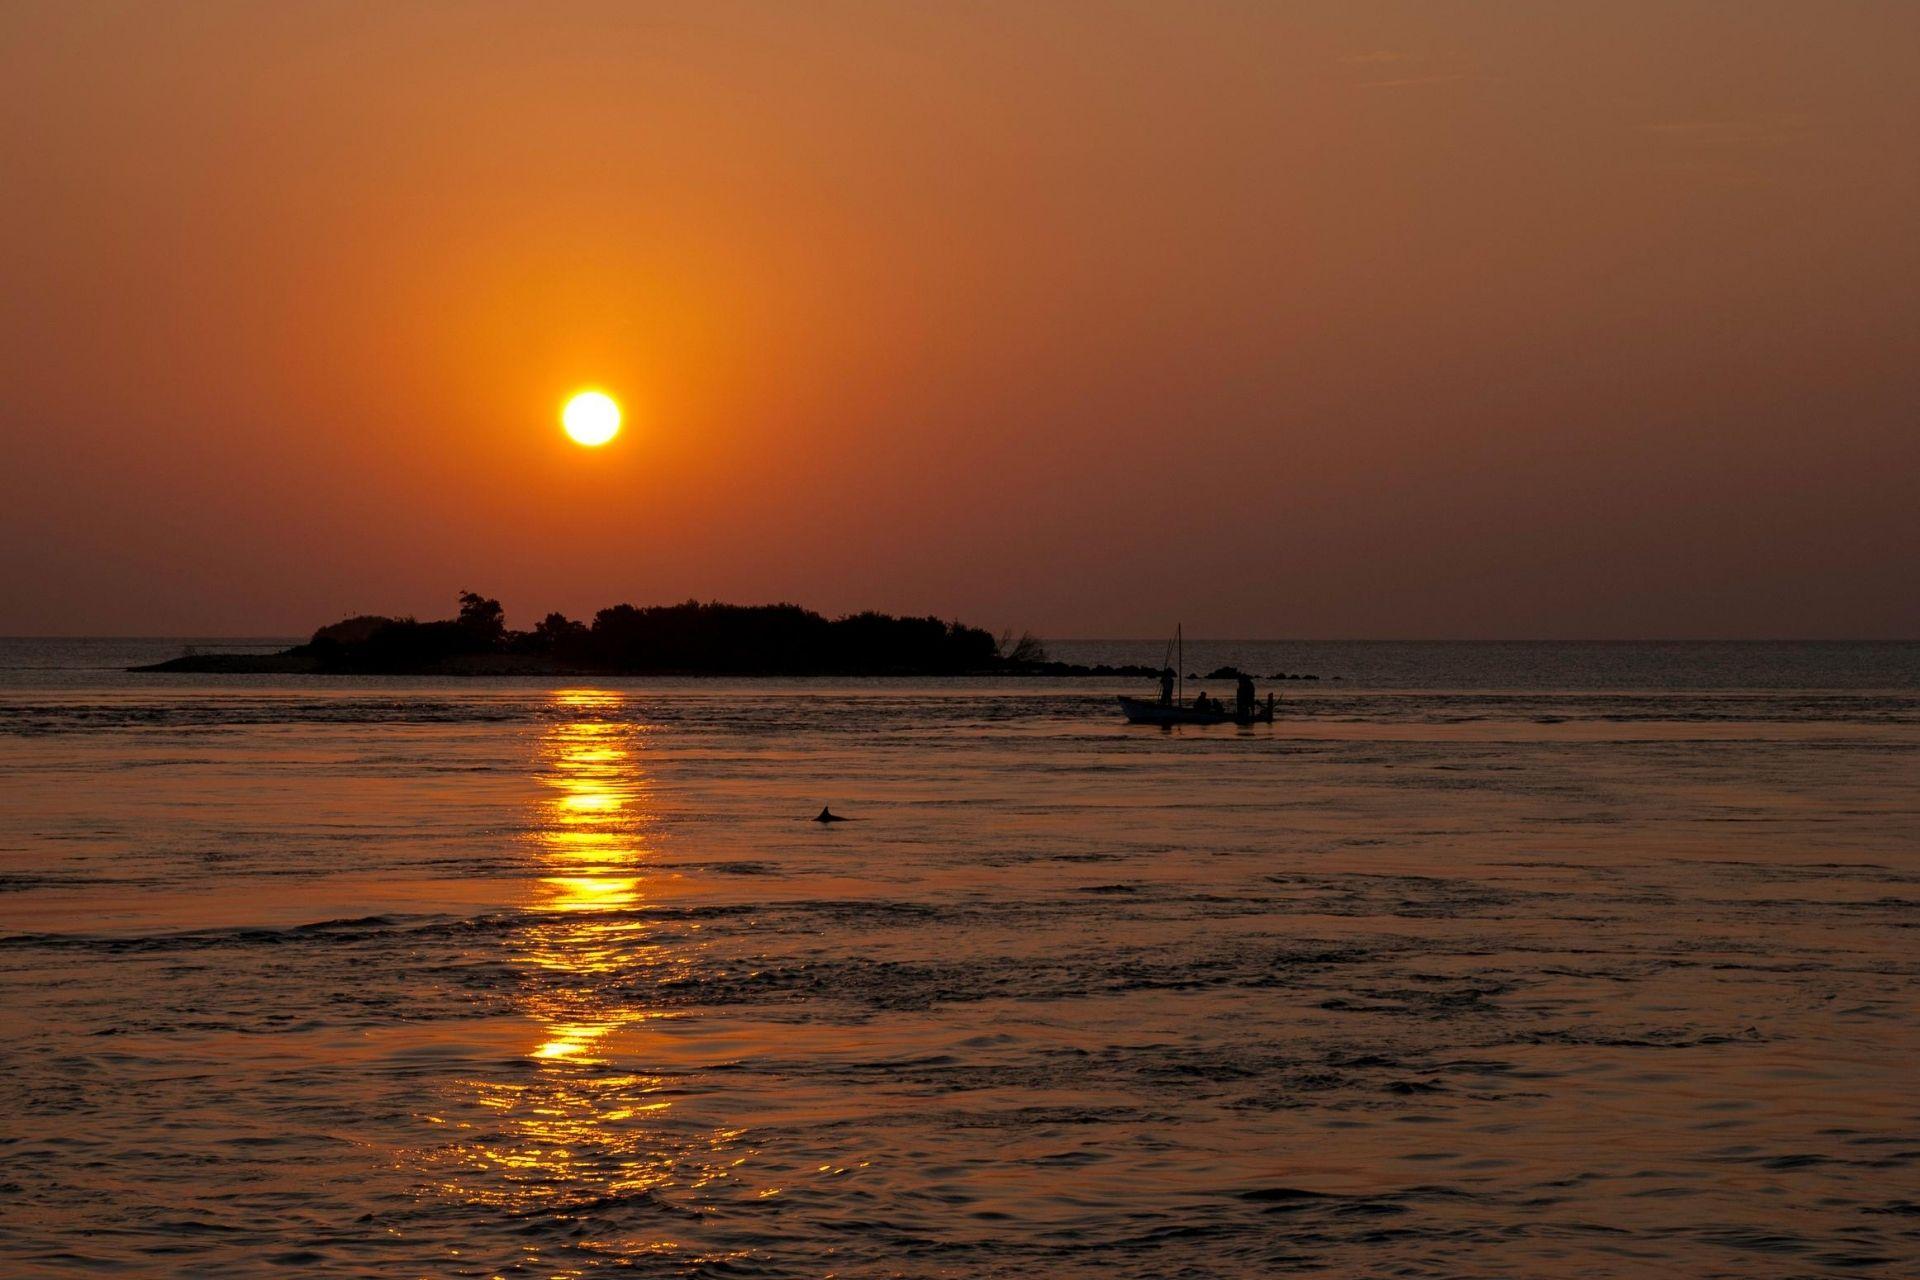 Maldives Sunset Dolphin Boat Trip